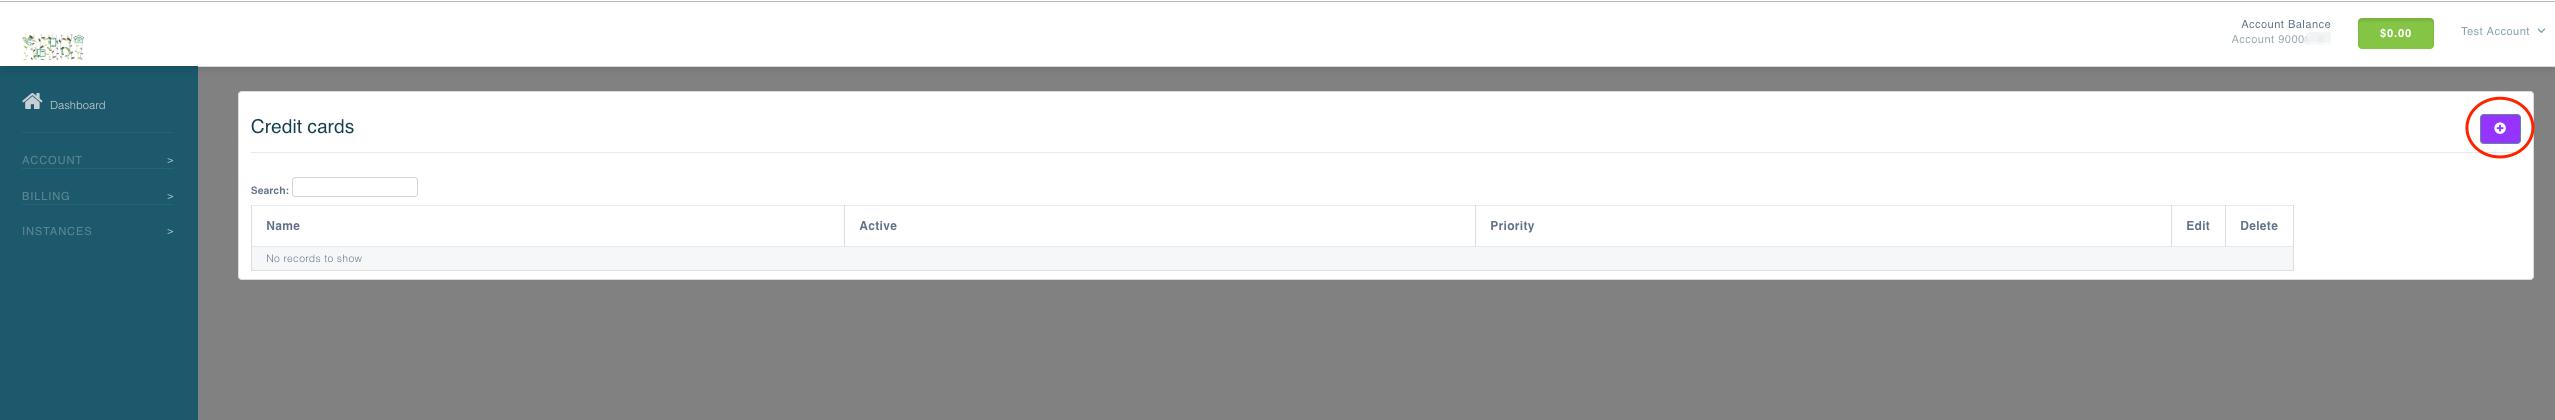 credit card main page screenshot add new credit card button circled